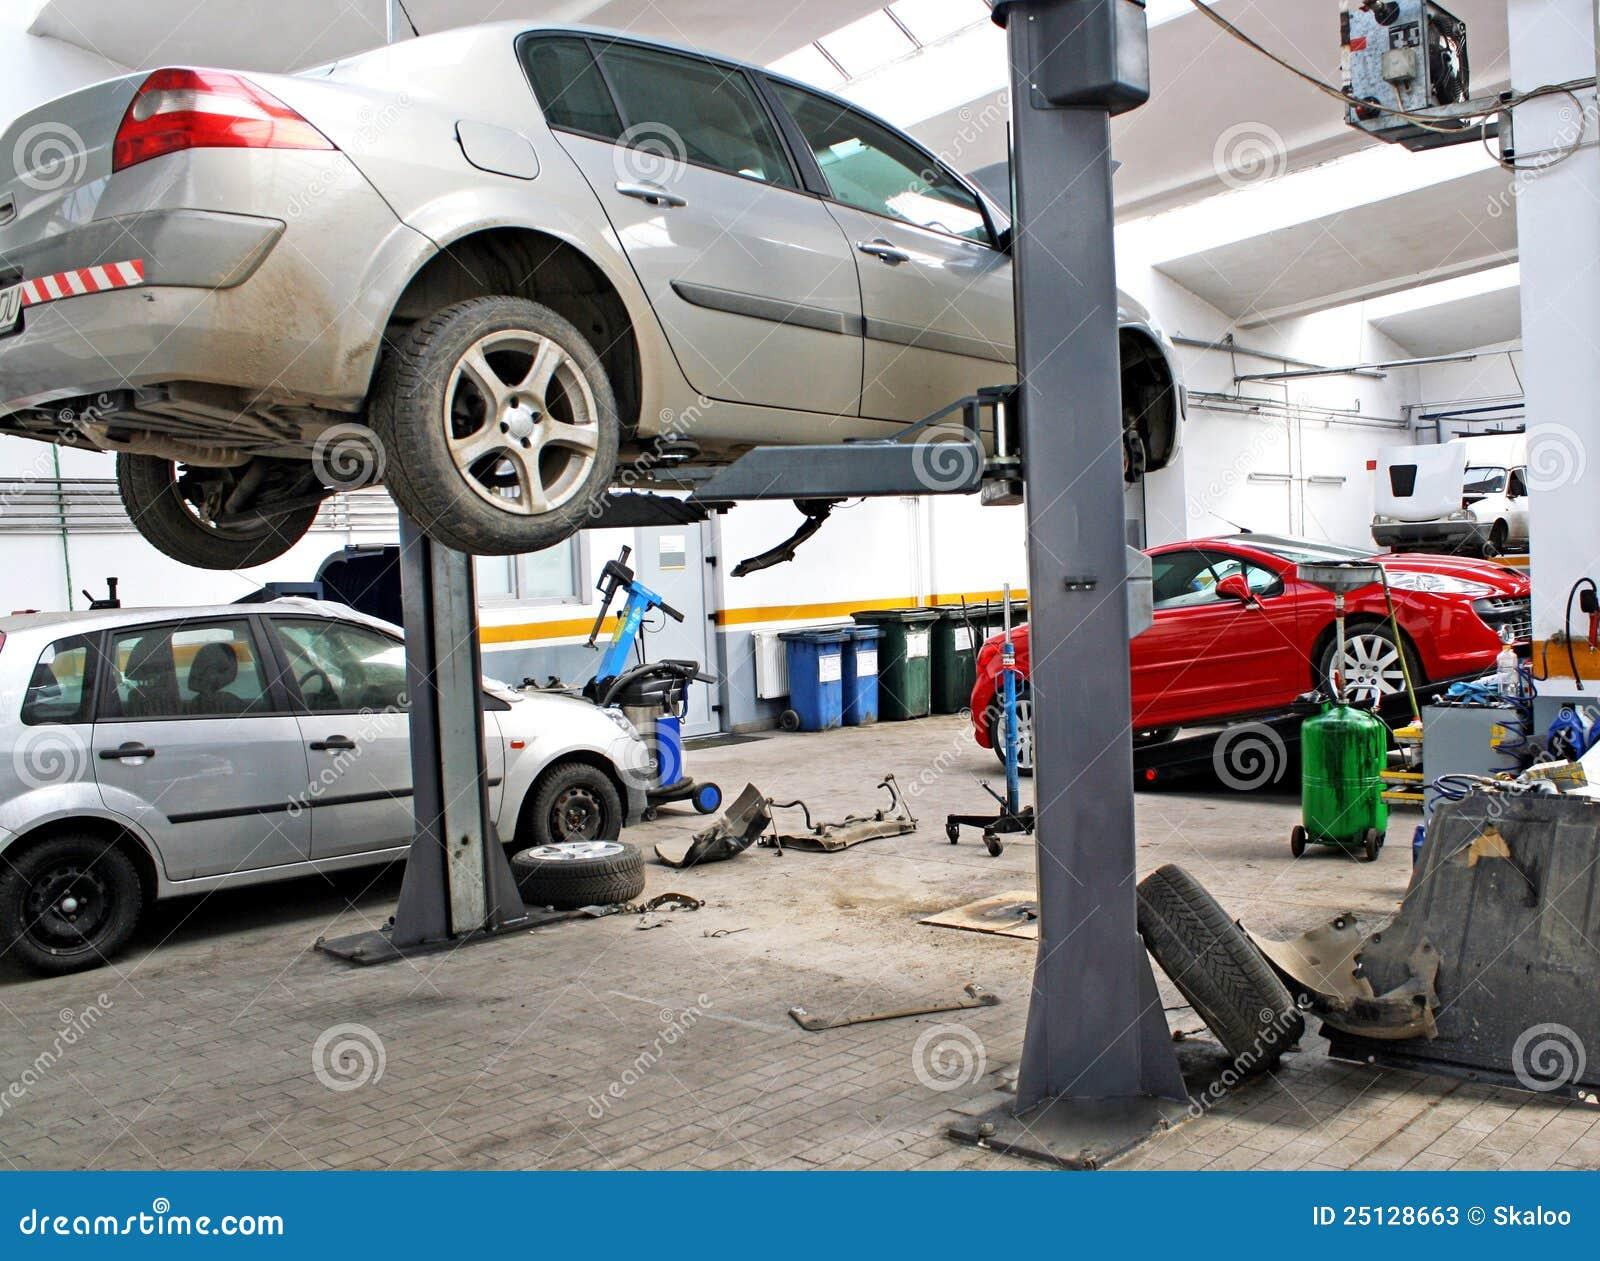 Automotive service garage stock photos image 25128663 for Garage villeneuve auto service